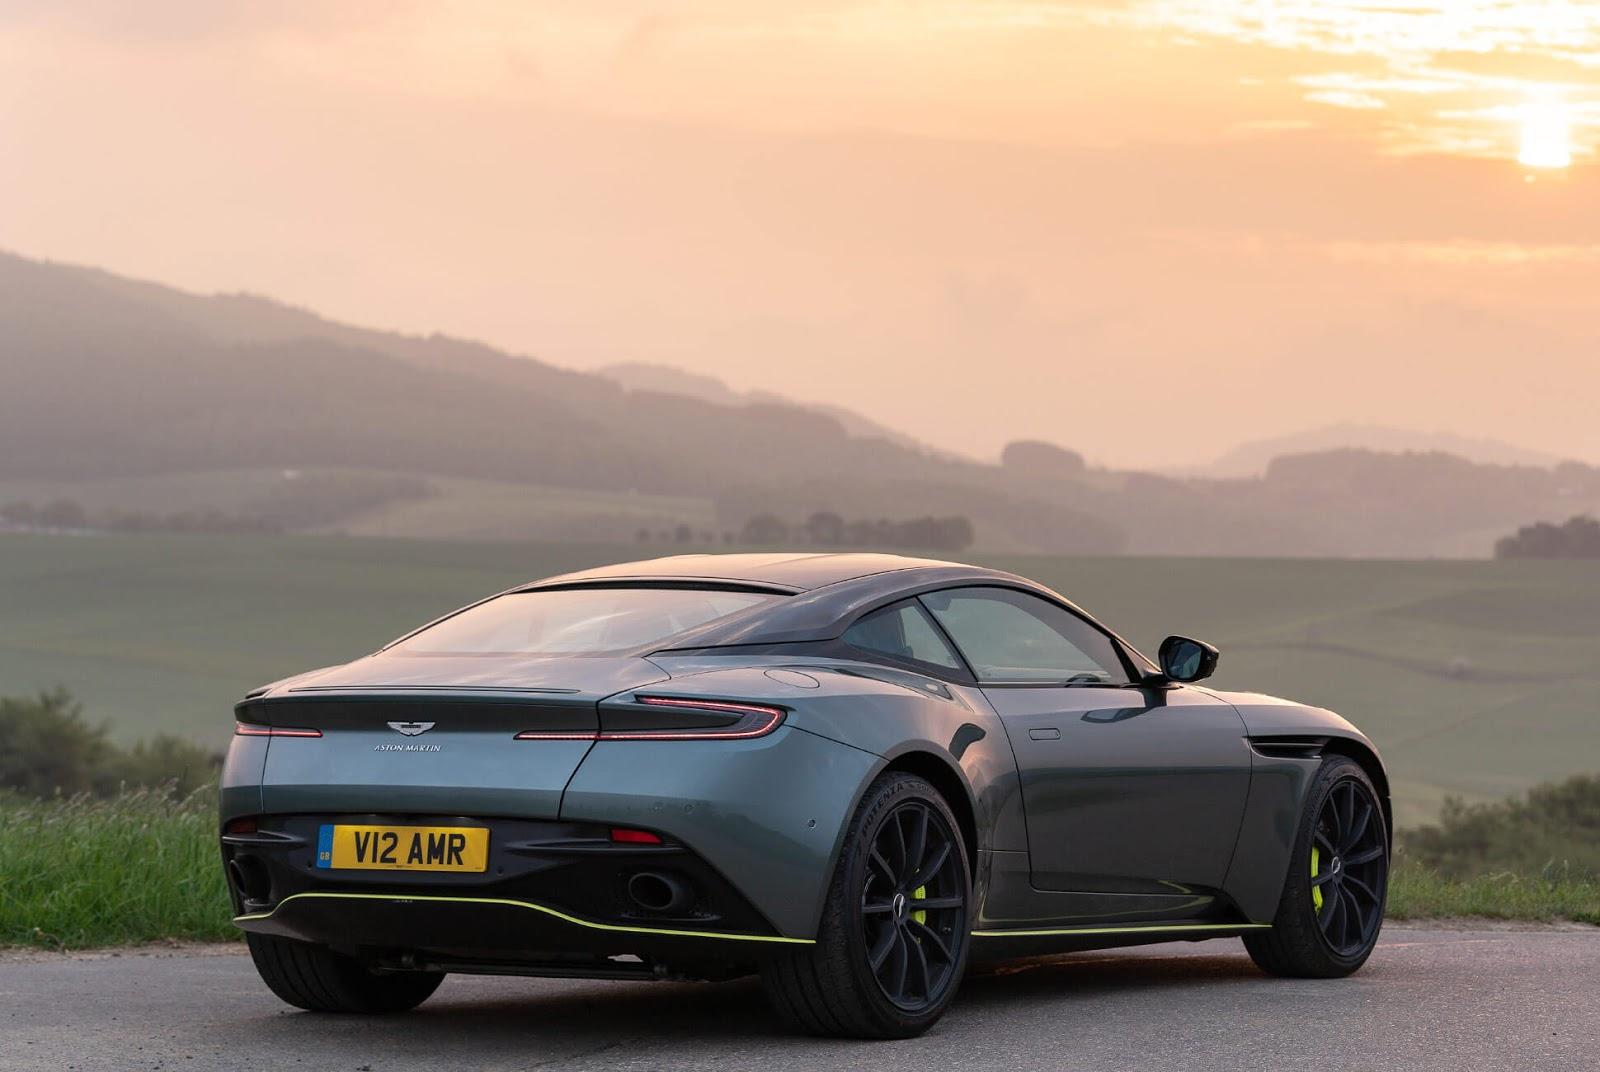 Aston Martin Db11 Amr 2019 Insight Trending